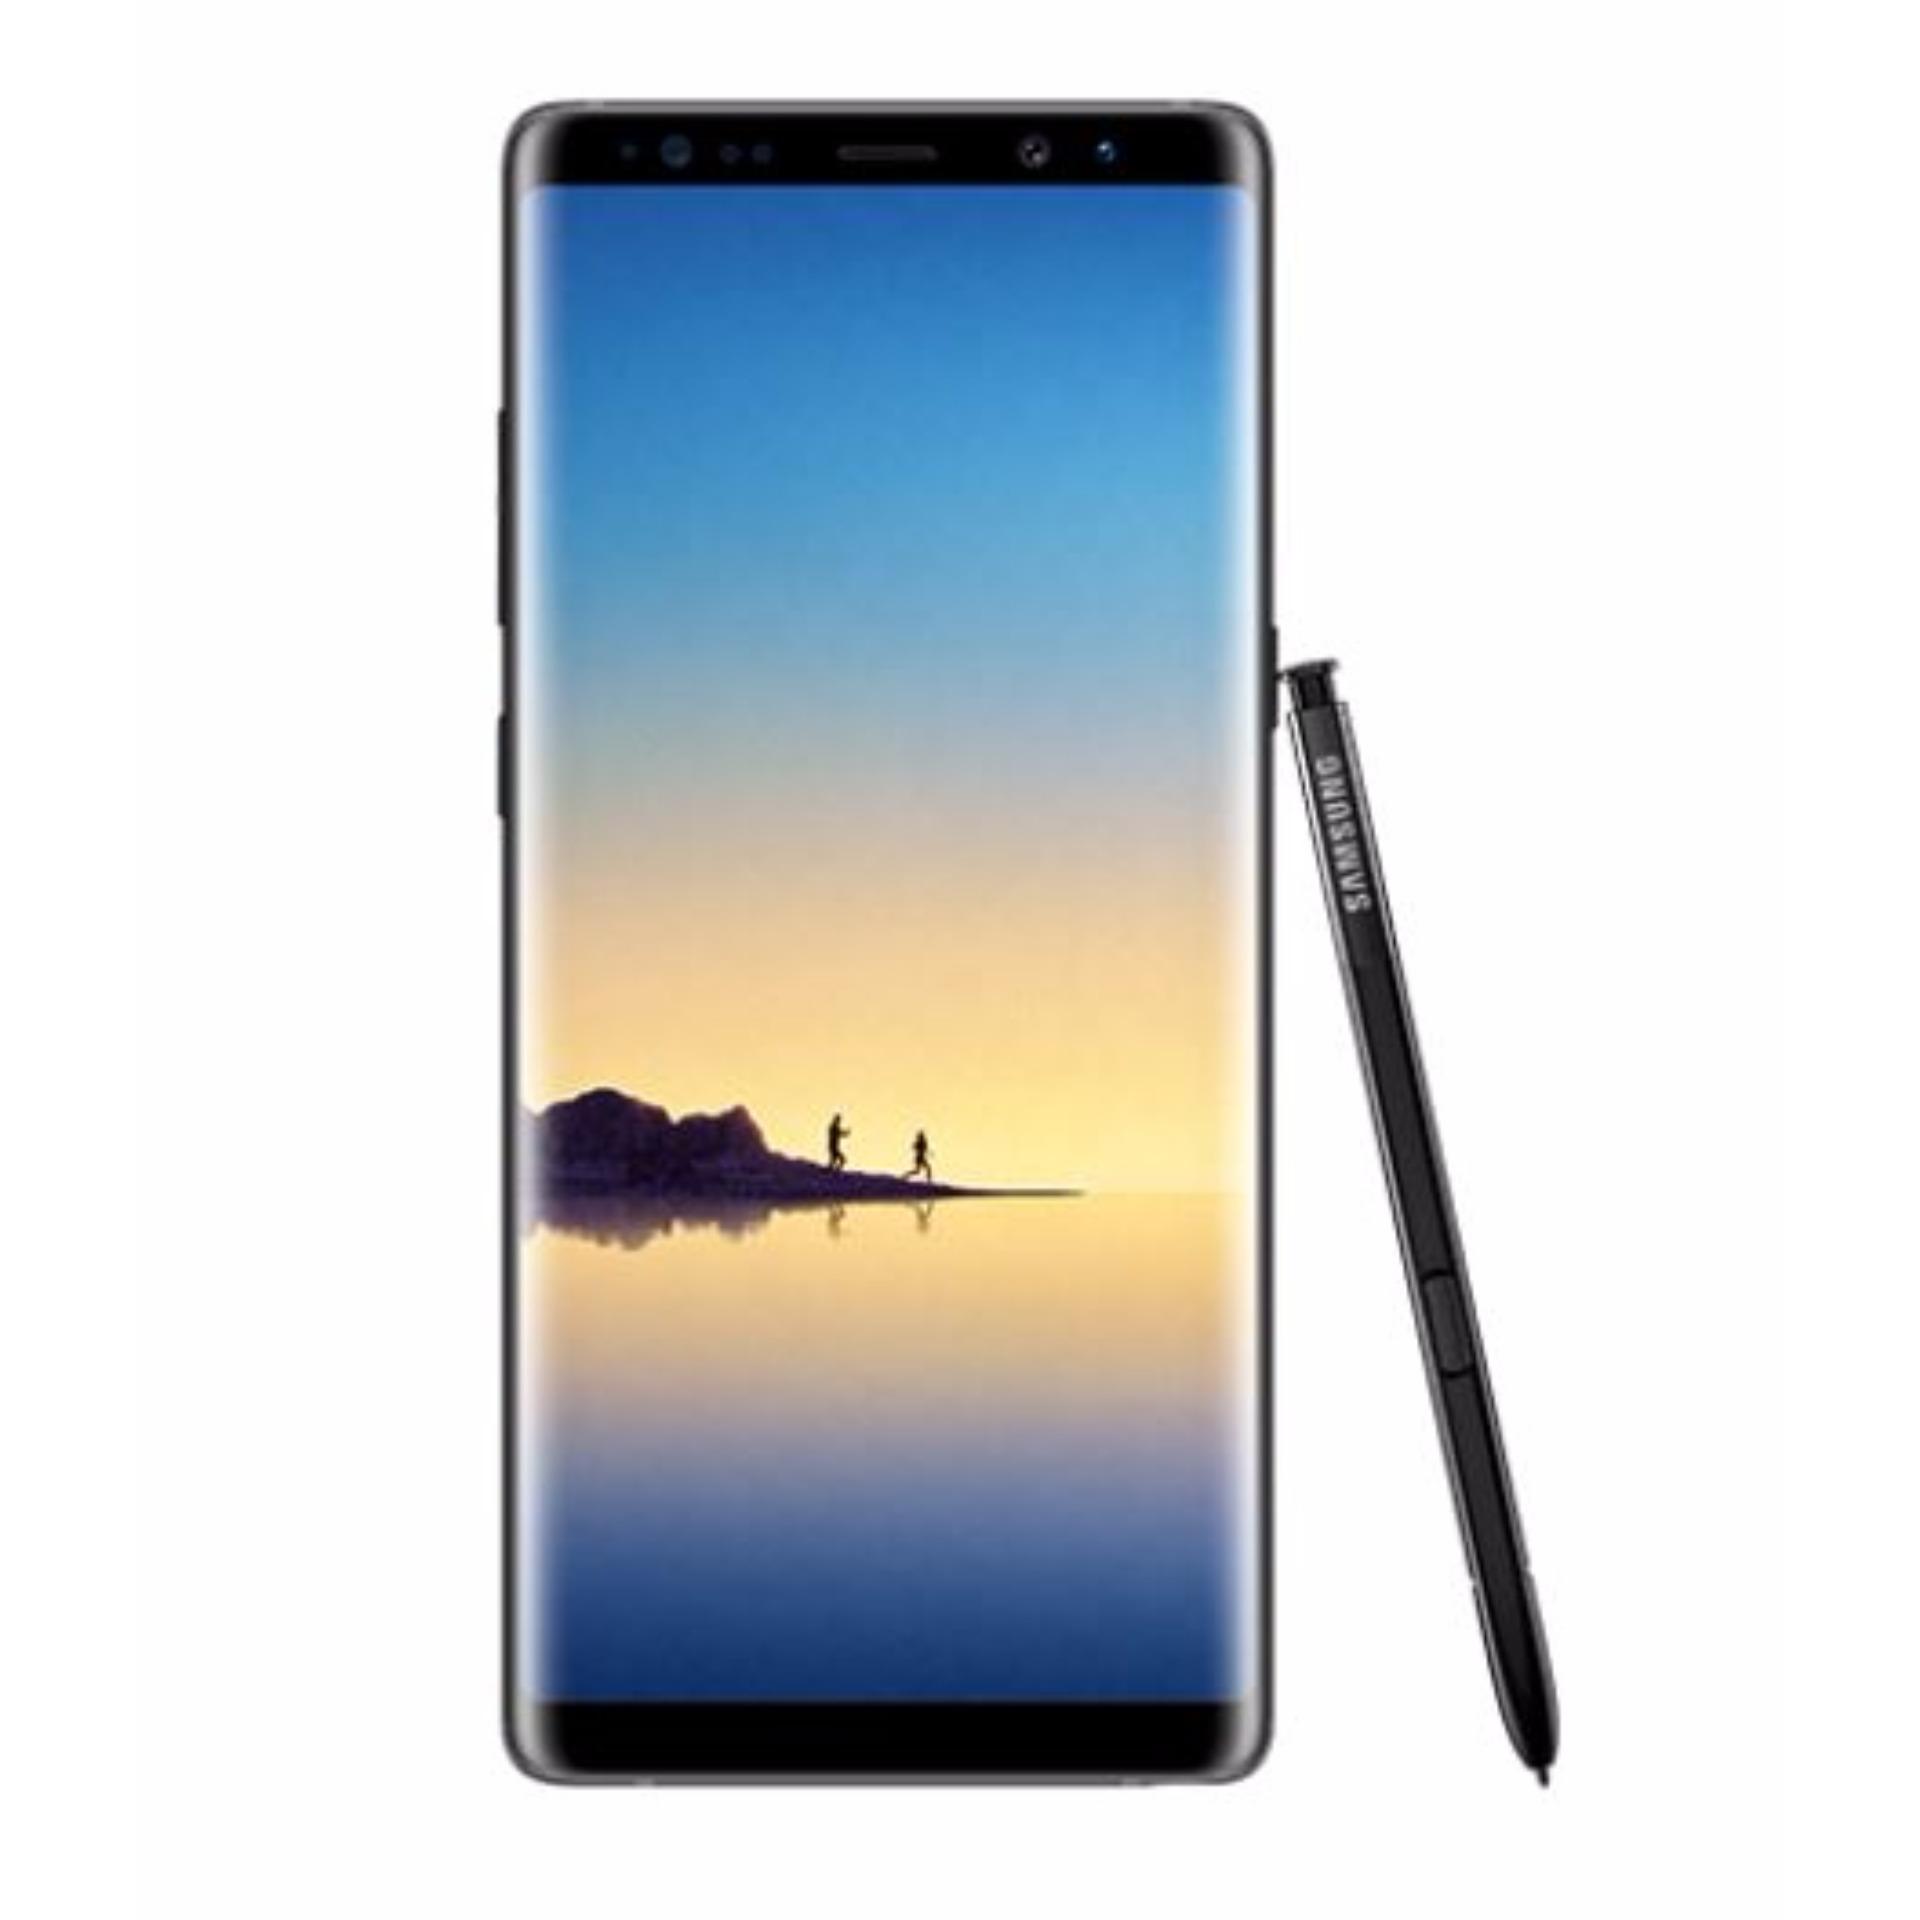 Buy Samsung Galaxy Note 8 64gb Midnight Black Free Akg Y50bt On Headphone Ear Bluetooth Headphones Singapore